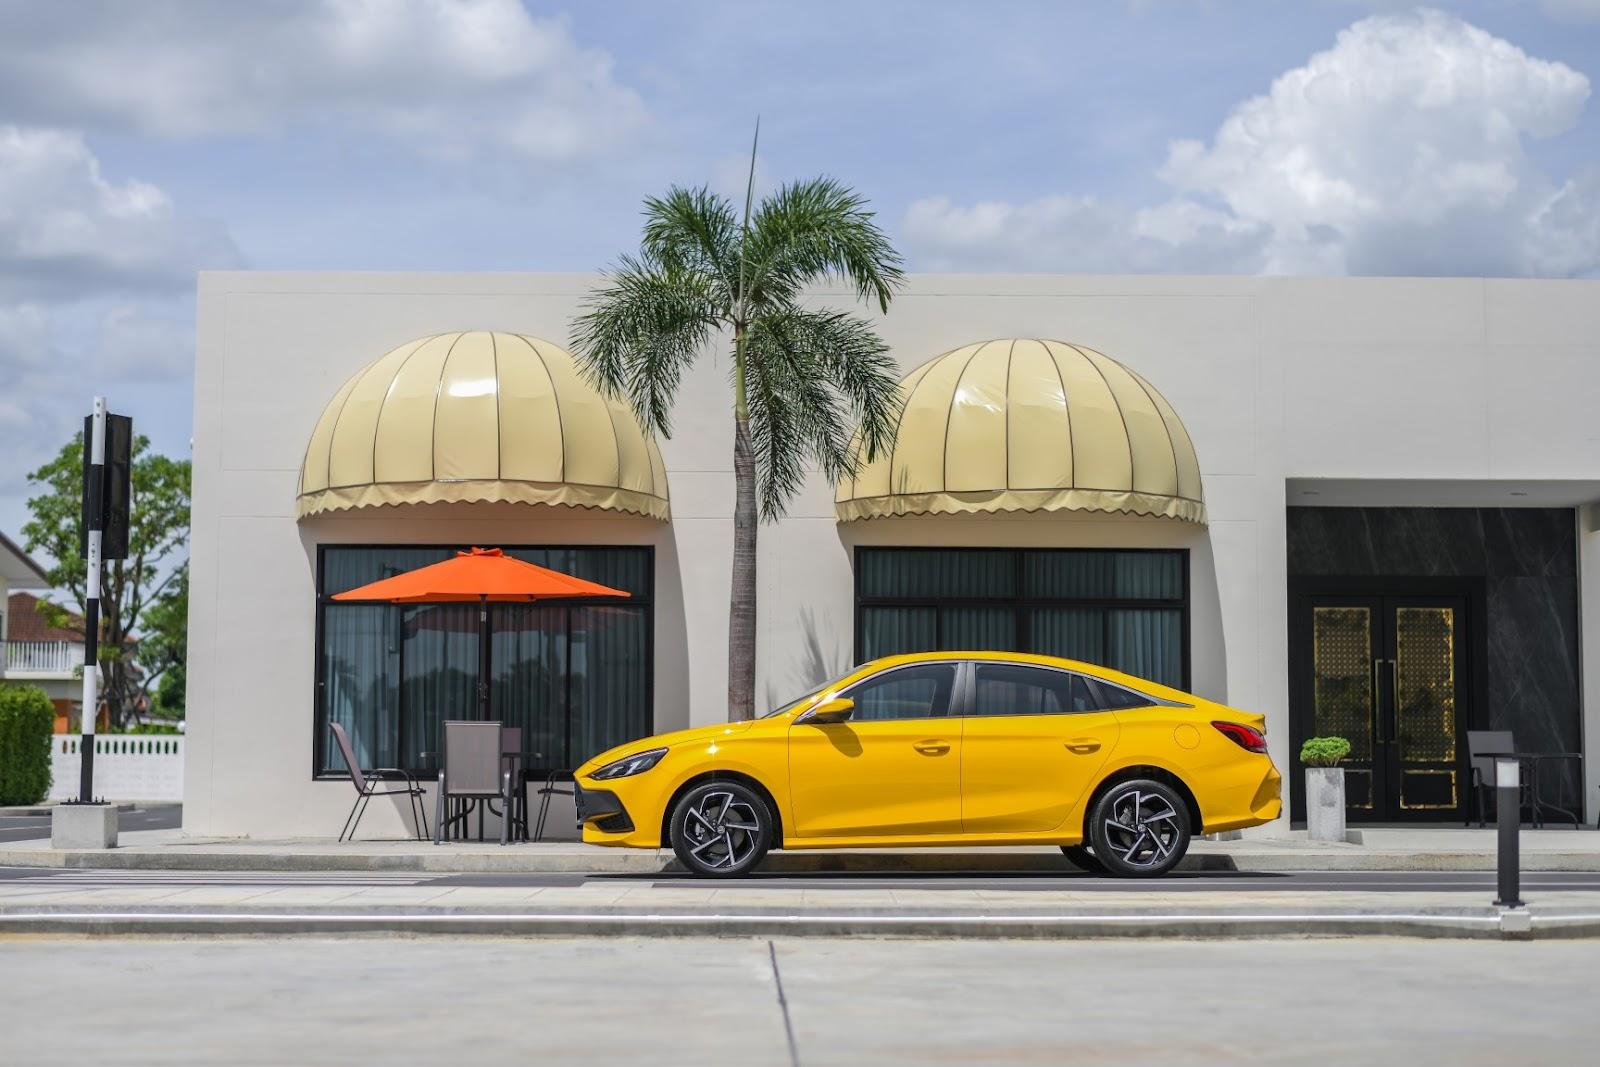 MG เปิดตัว ALL NEW MG5 ด้วยแนวคิด BEYOND รถยนต์สไตล์สปอร์ตคูเป้ซีดาน ตอบโจทย์คนรุ่นใหม่ด้วยความเหนือชั้นกว่าเทียบชั้นรถยนต์ในกลุ่ม C-Sedan ในราคาเริ่มต้นเพียง 559,000 บาท